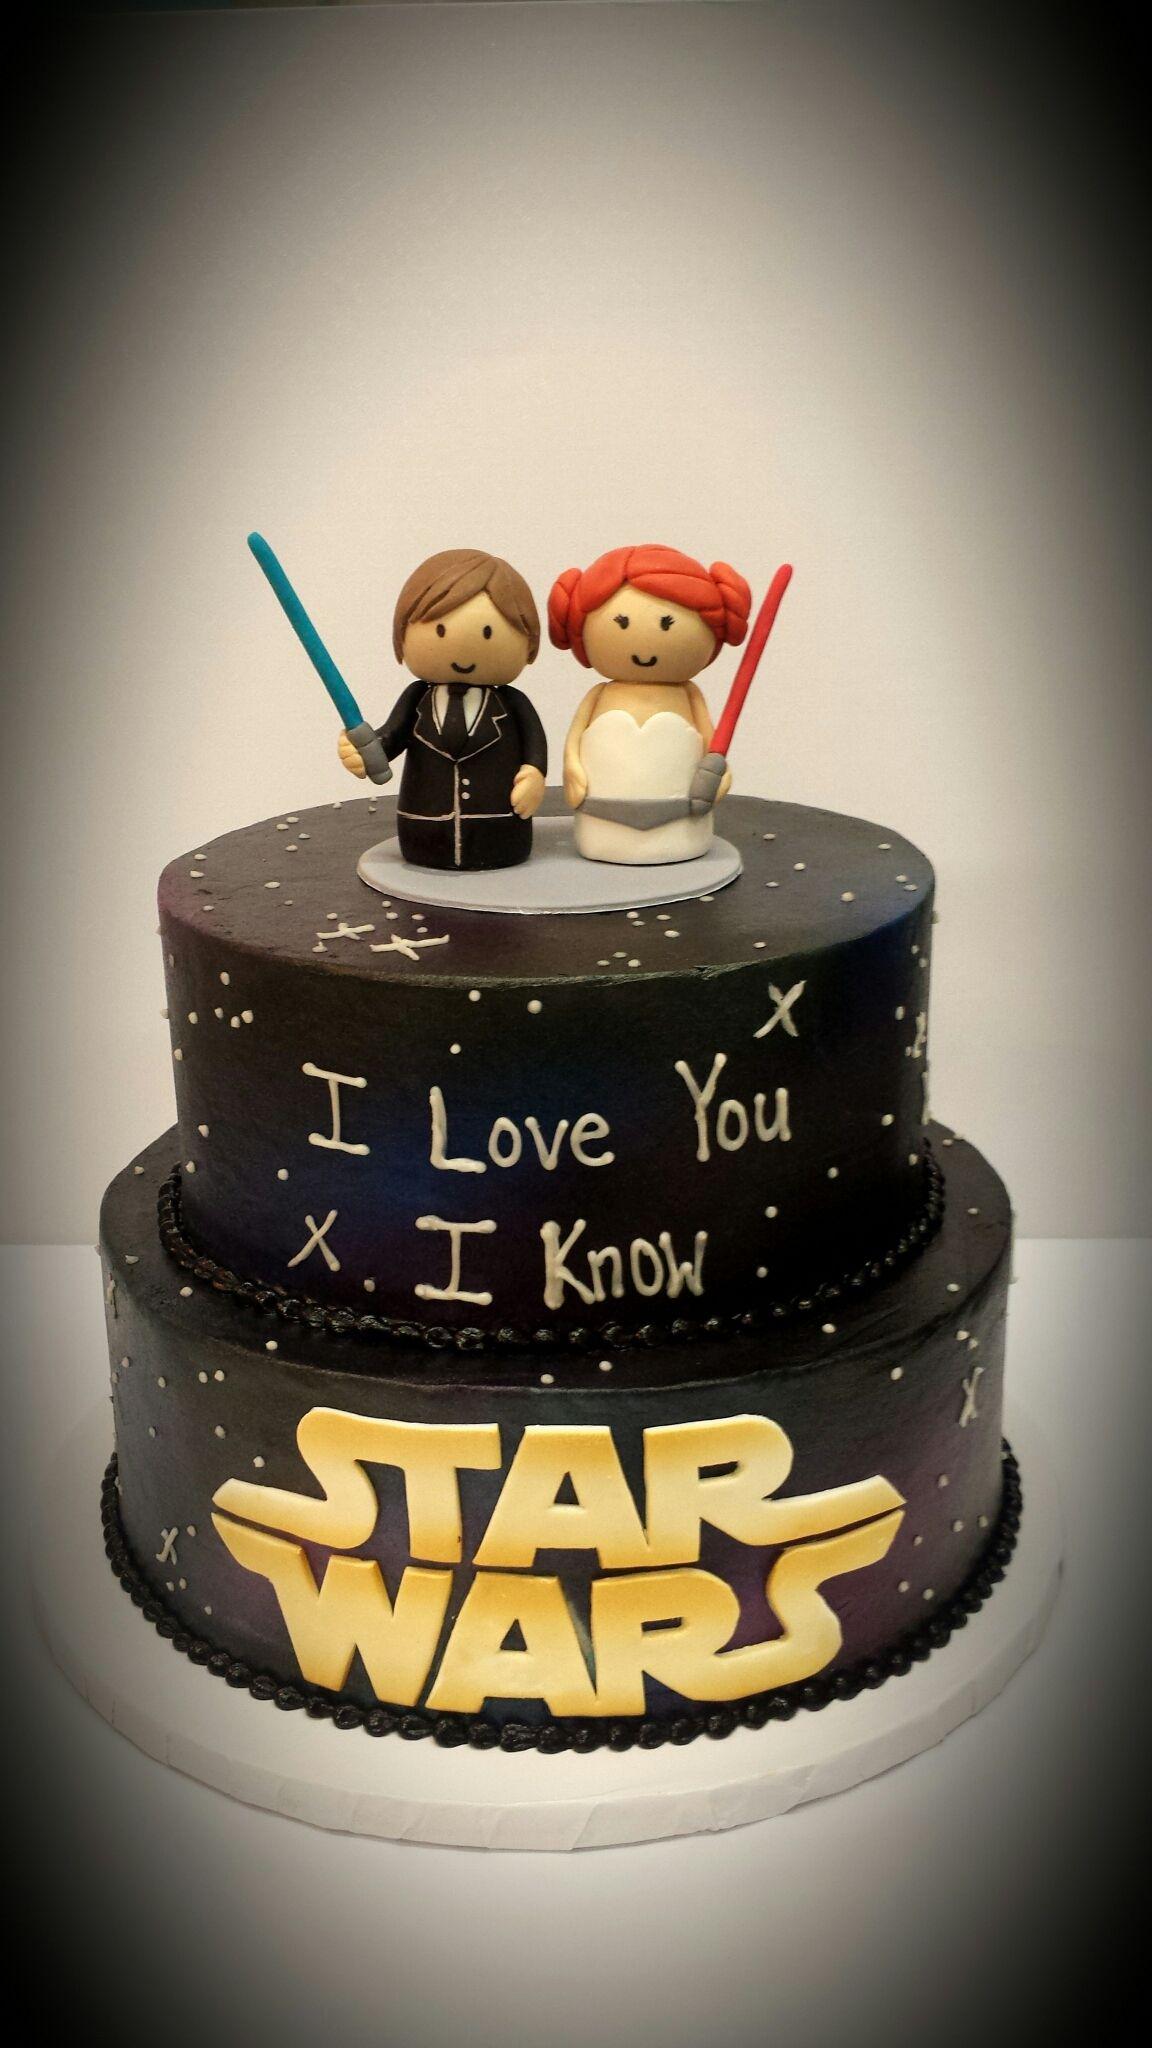 Small Crop Of Star Wars Wedding Cake